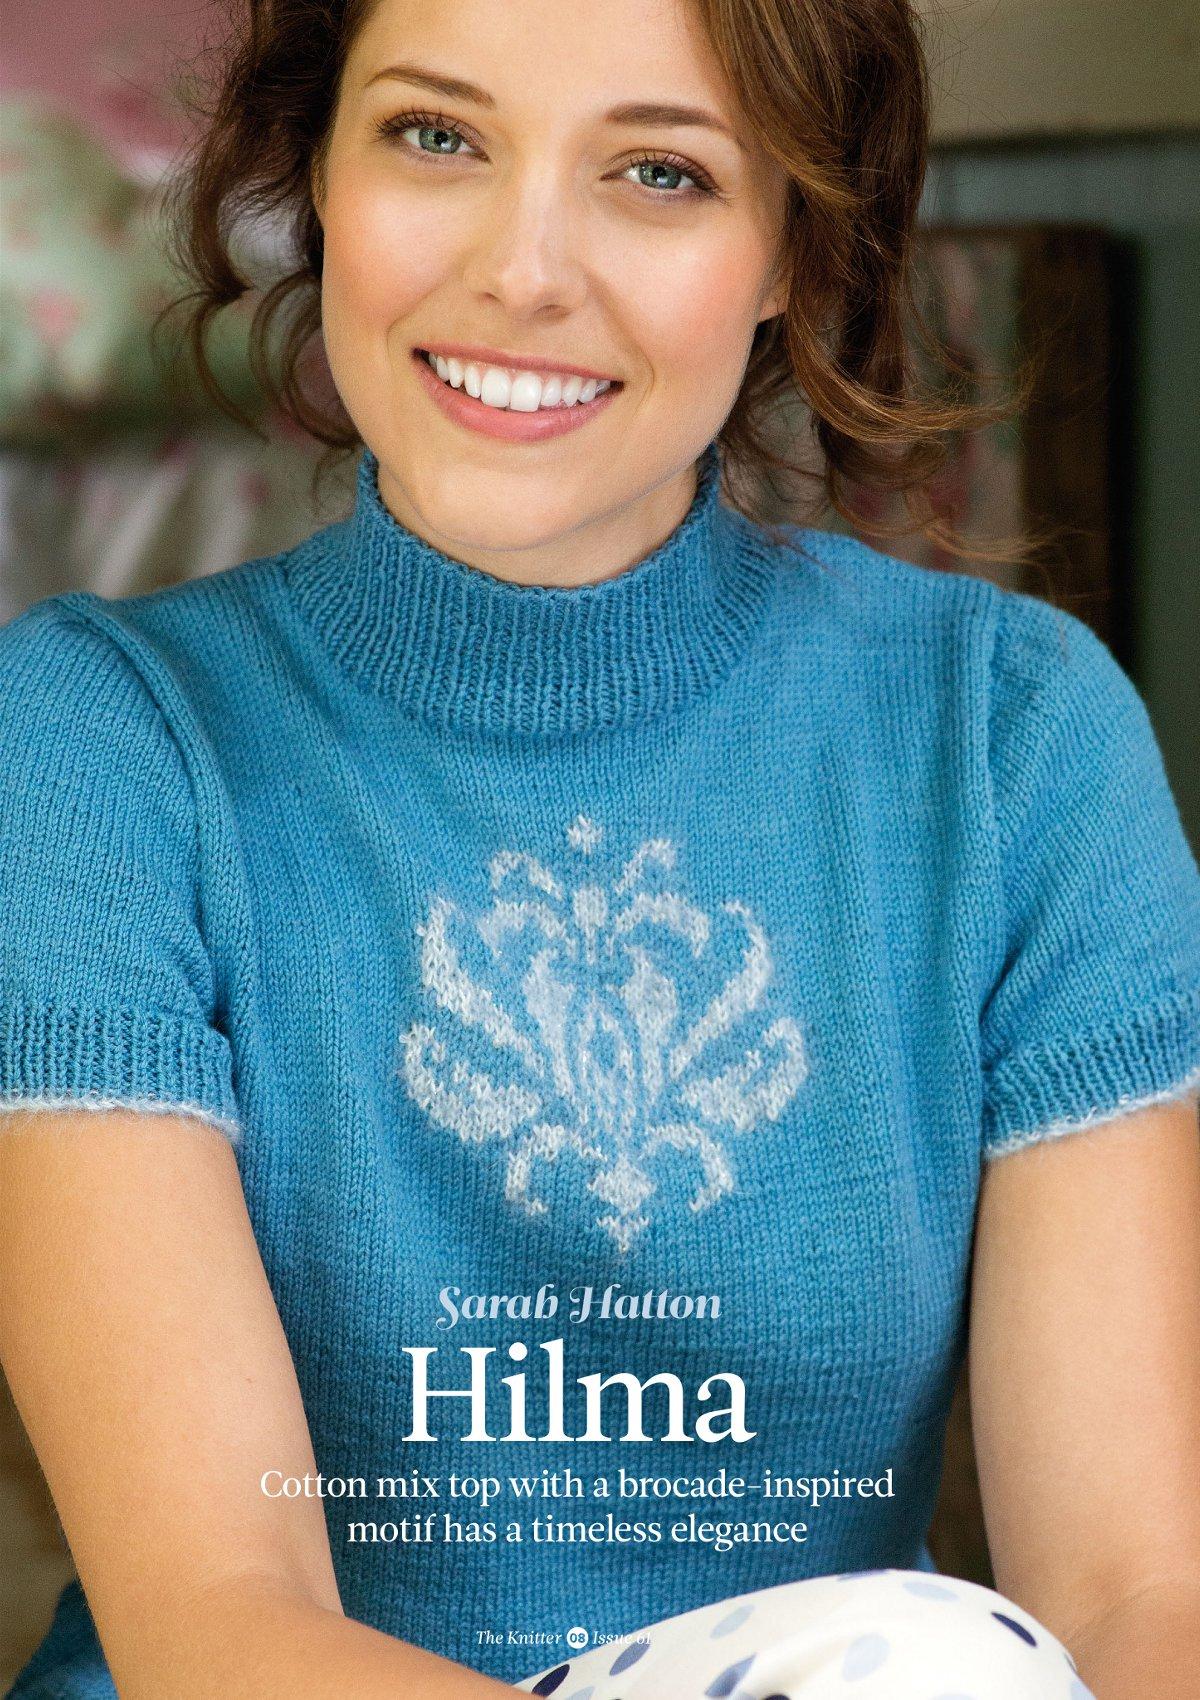 http://vjazhi.ru/images/stories/The_knitter/61/Hilma.jpg